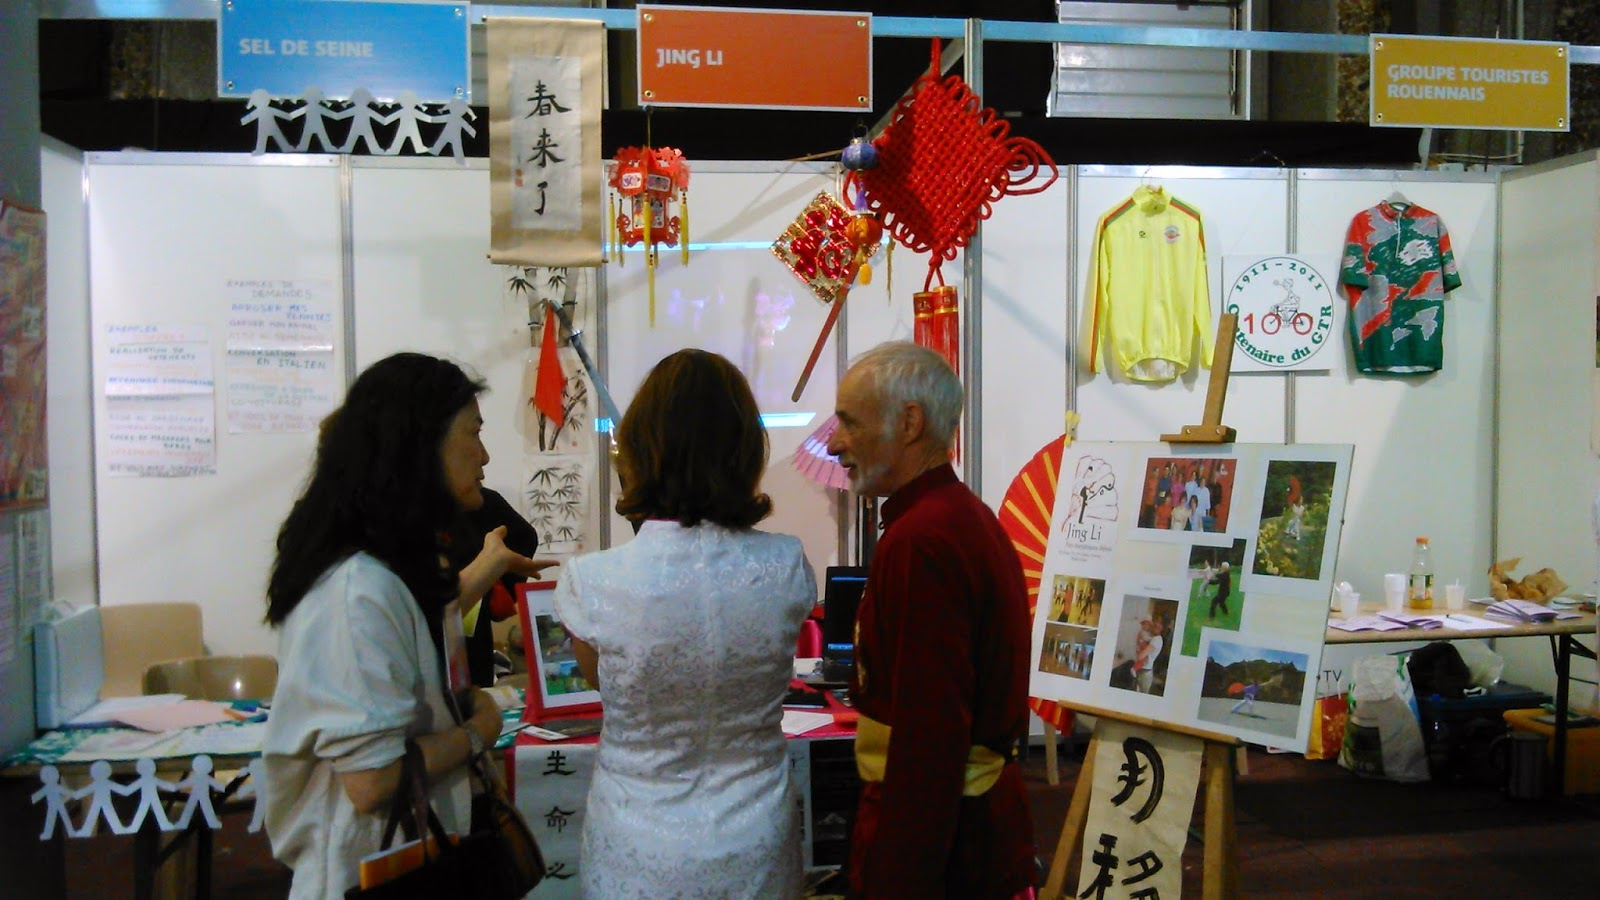 Stand Jing Li Forum des associations Rouen 2014